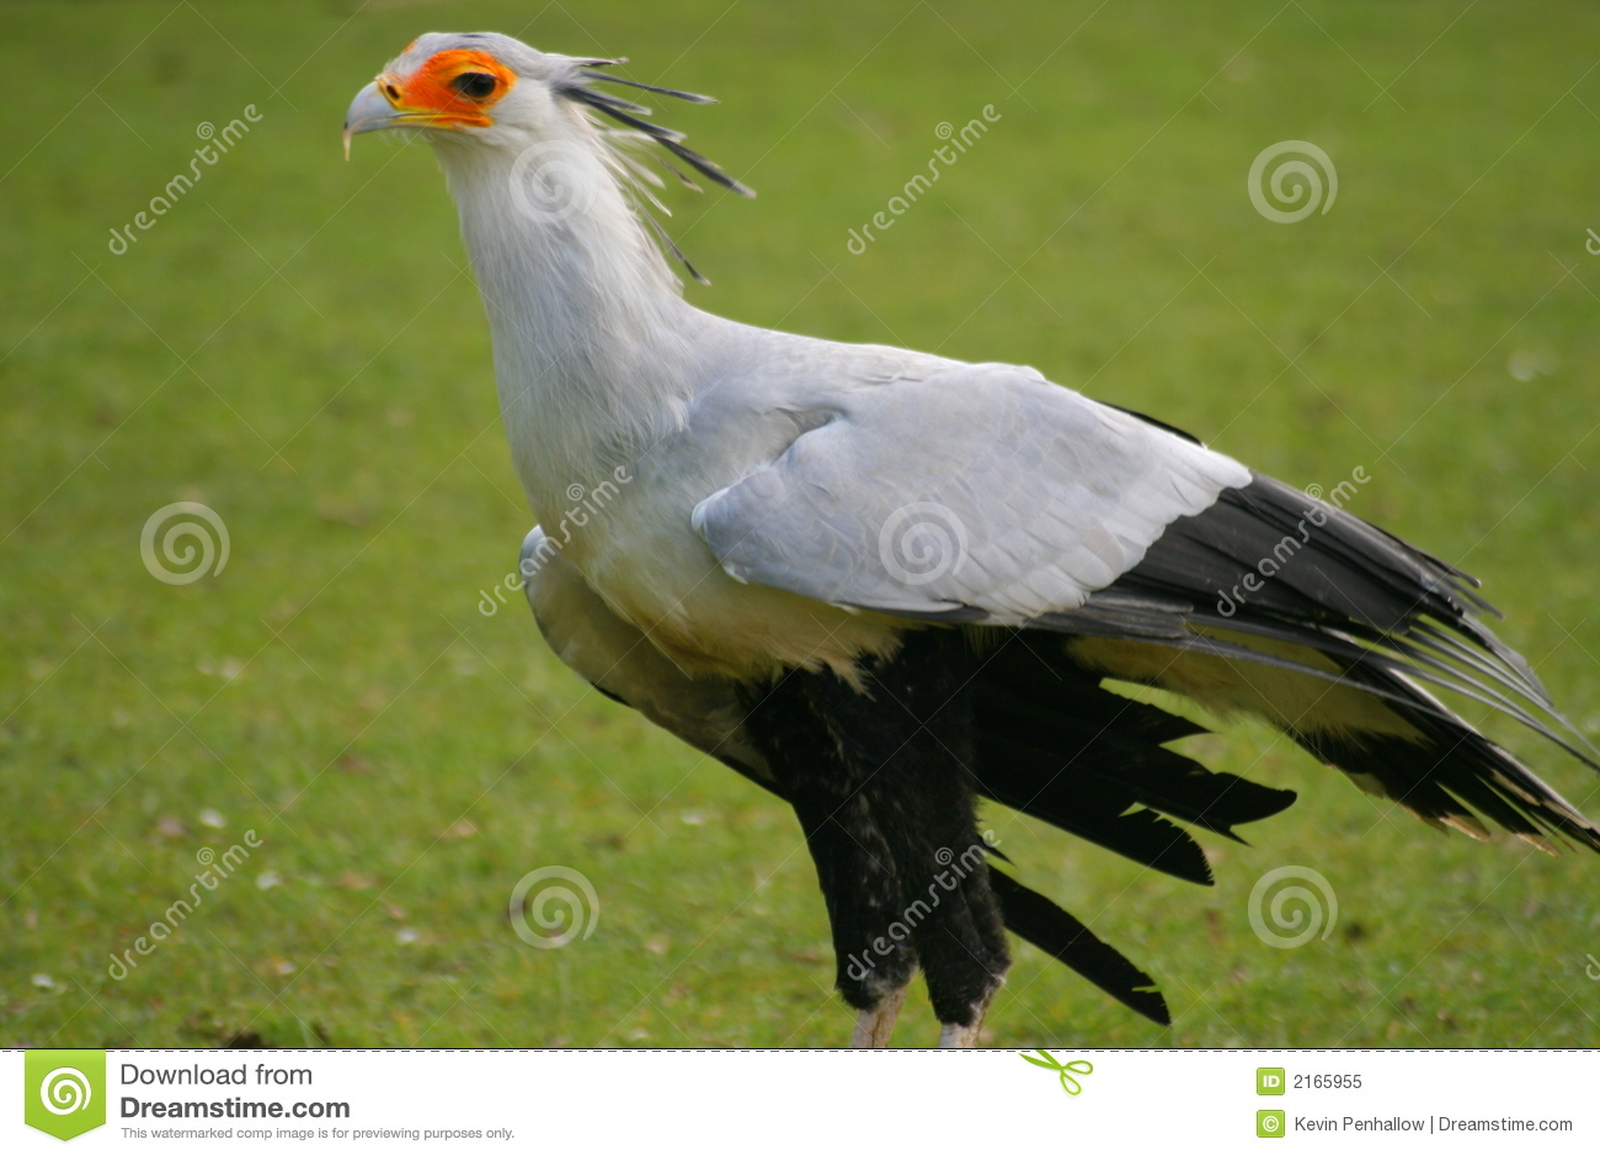 Sekretär Vogel Lizenzfreies Stockfoto  Bild 2165955